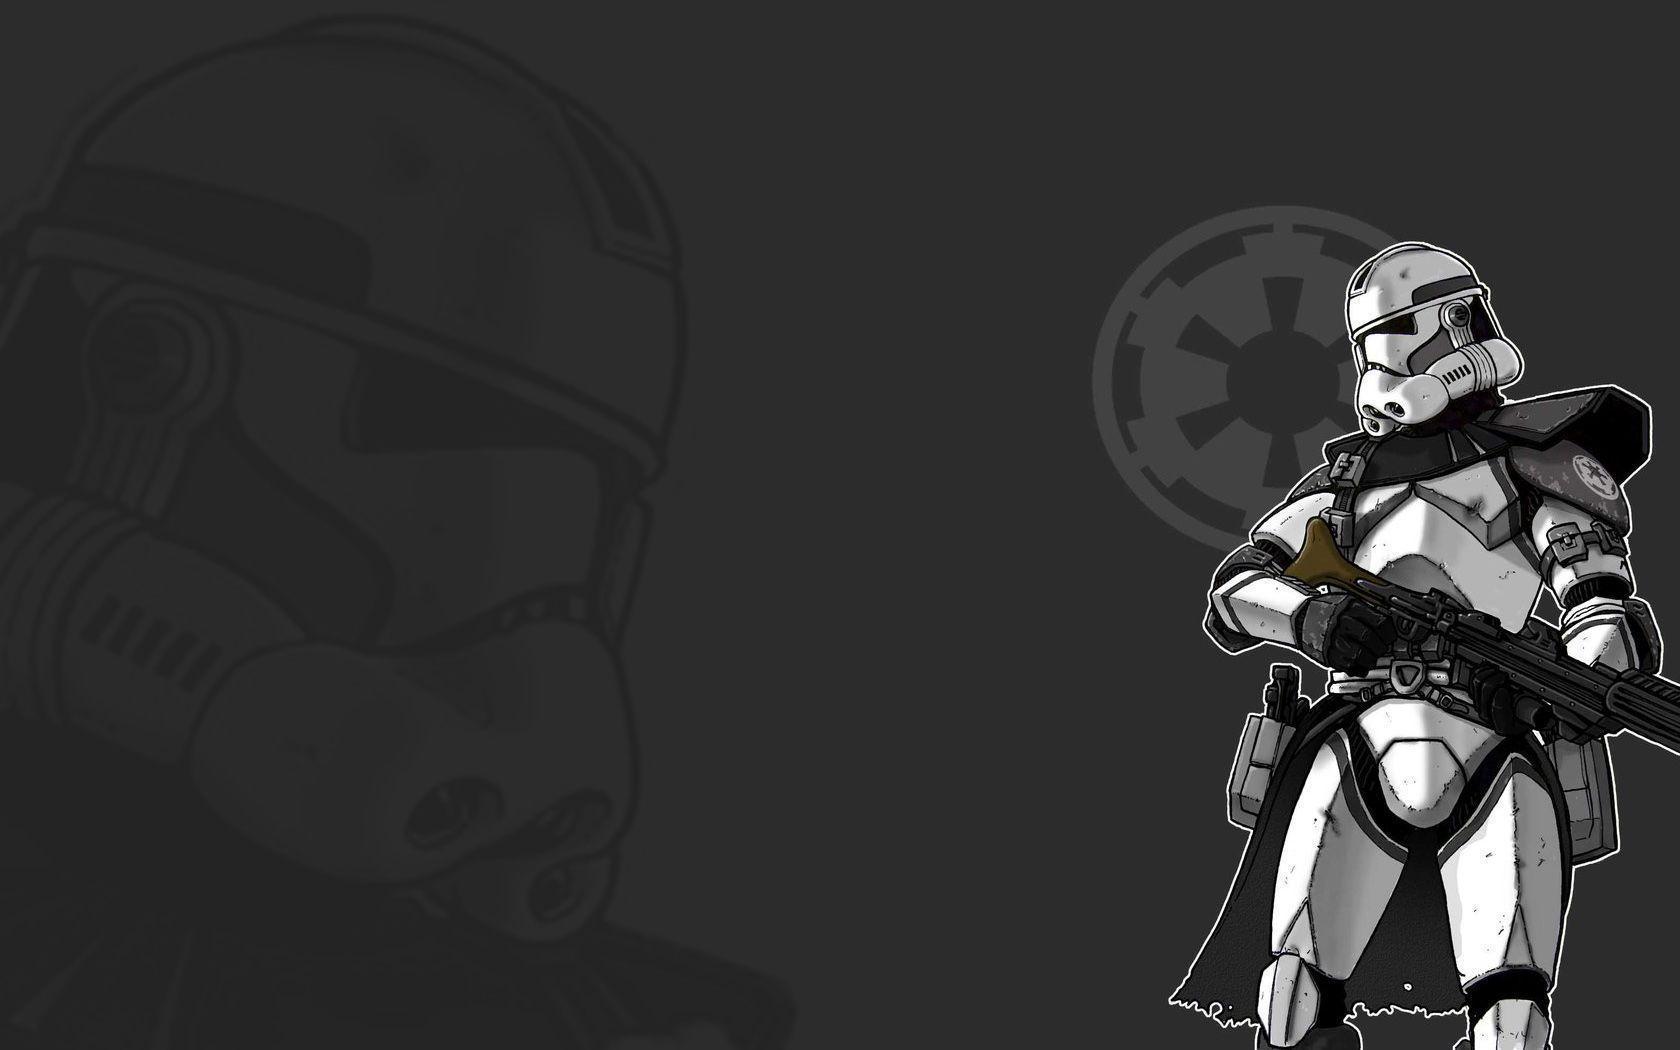 Star Wars Clone Troopers Wallpapers Top Free Star Wars Clone